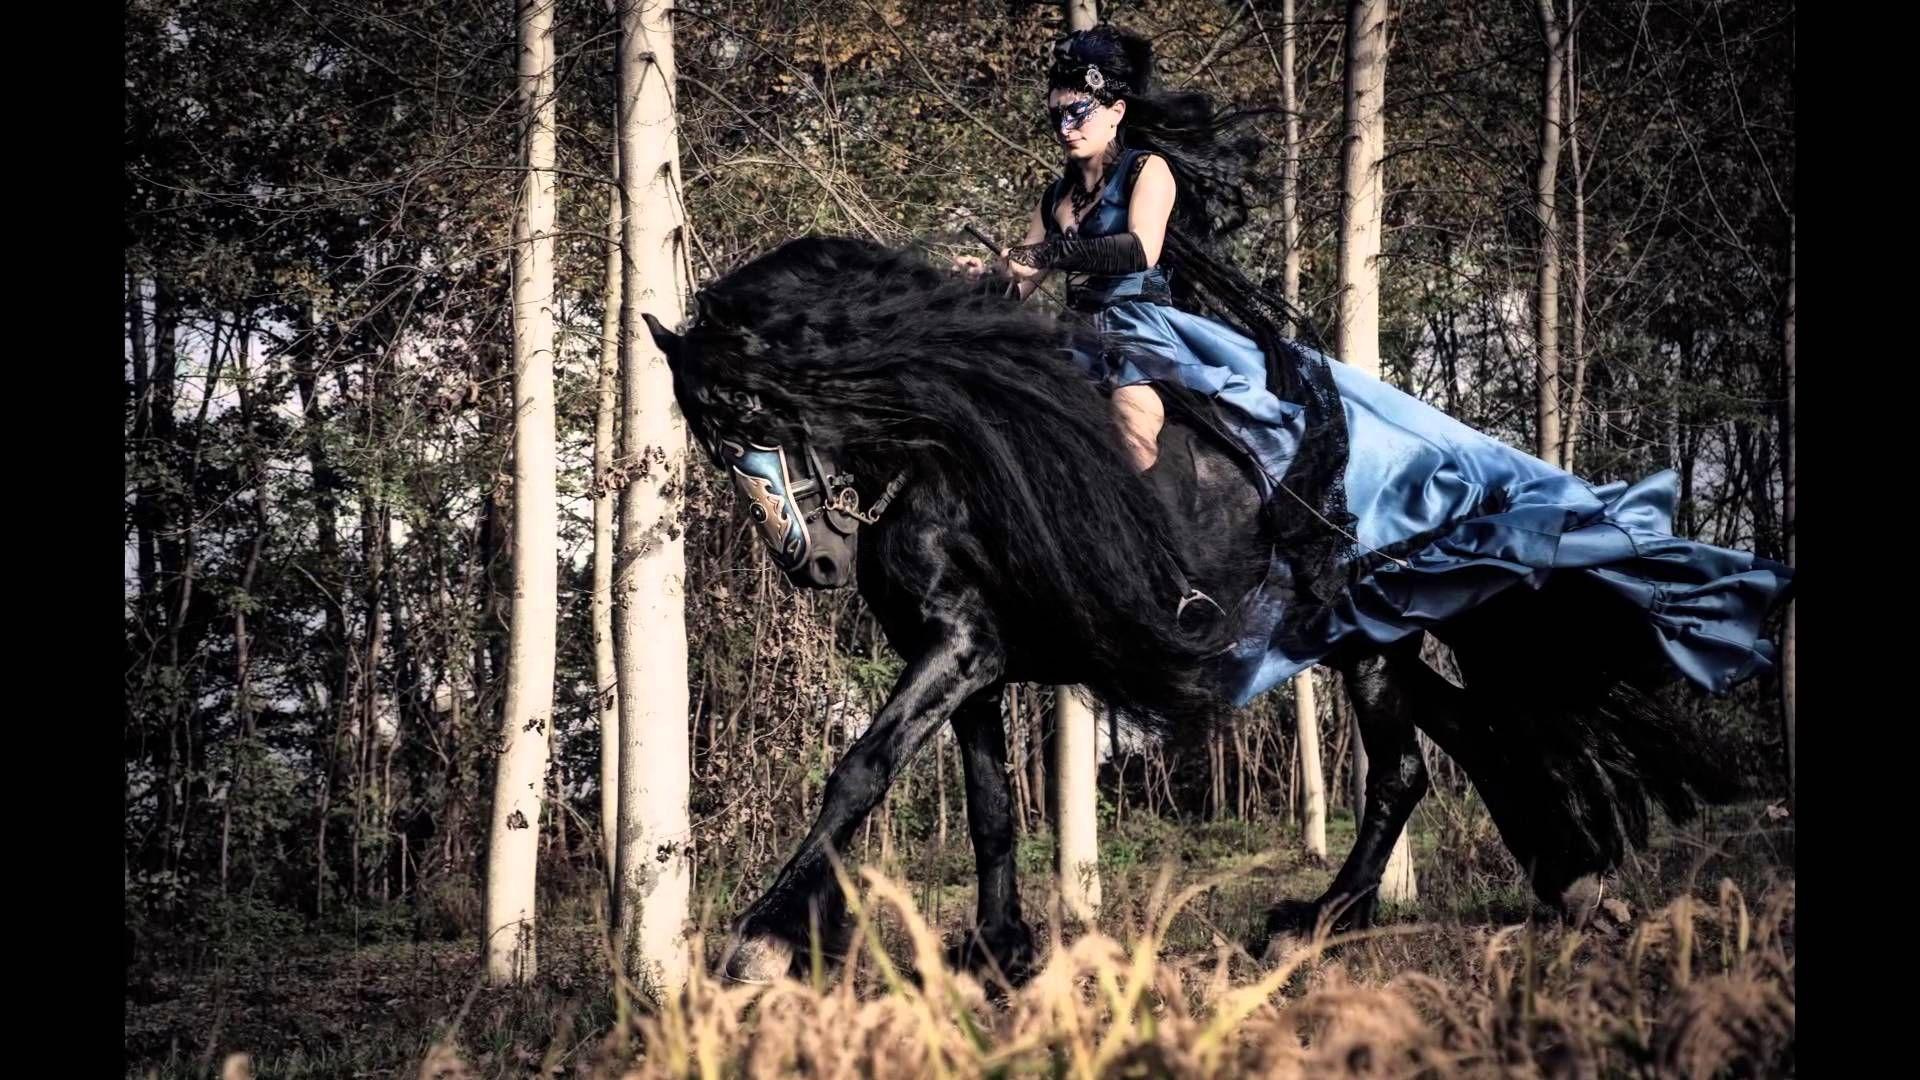 Most Inspiring Wallpaper Halloween Horse - a8a1cb20e4695baba61c1f15b0a64cdd  You Should Have_329234.jpg